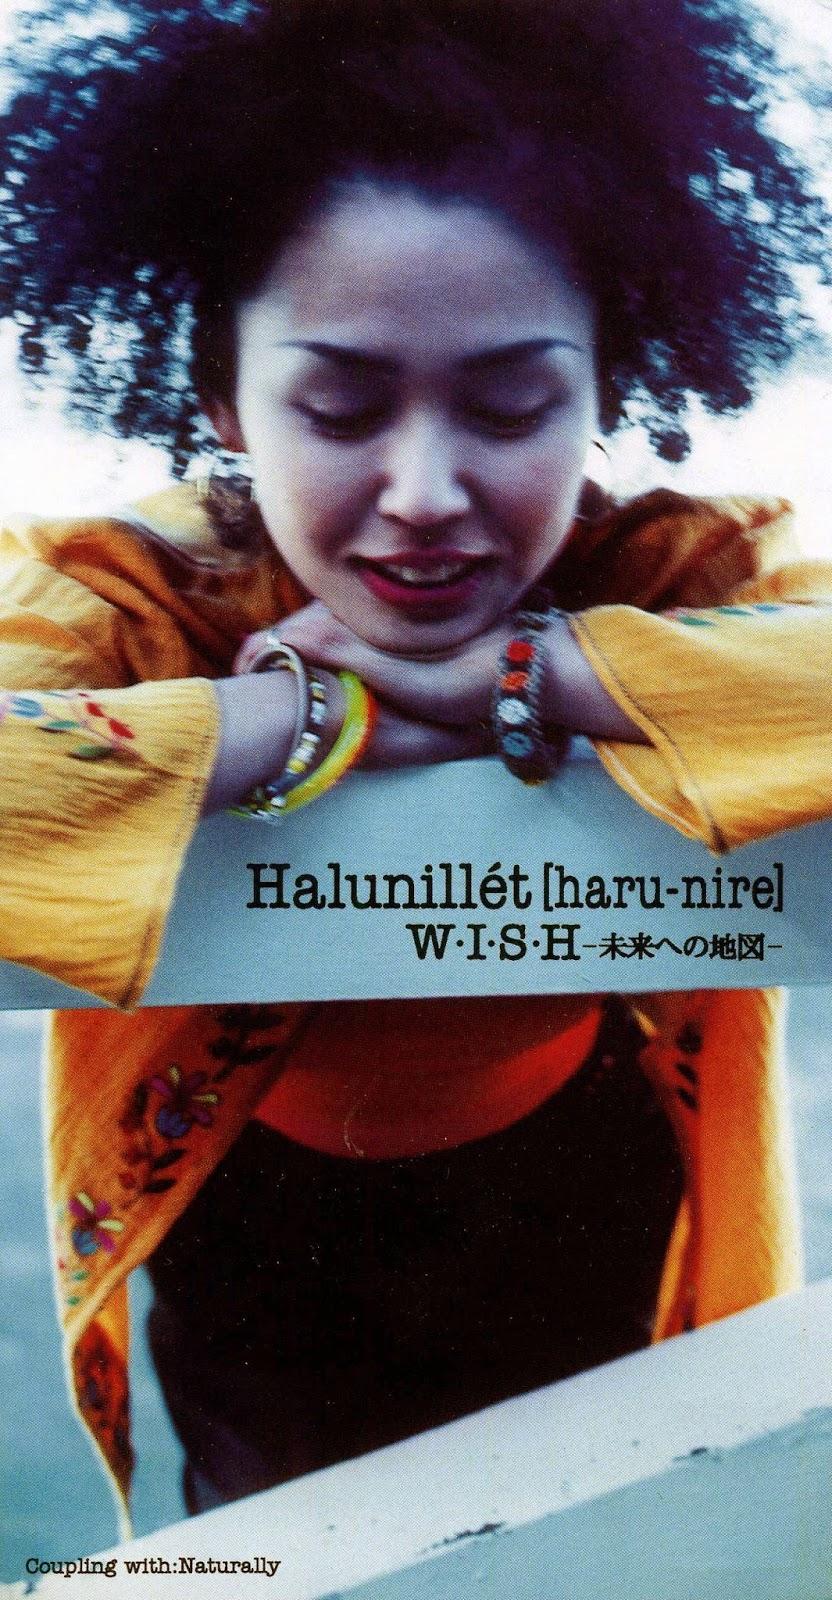 Halunillet - W・I・S・H ~未来への地図~